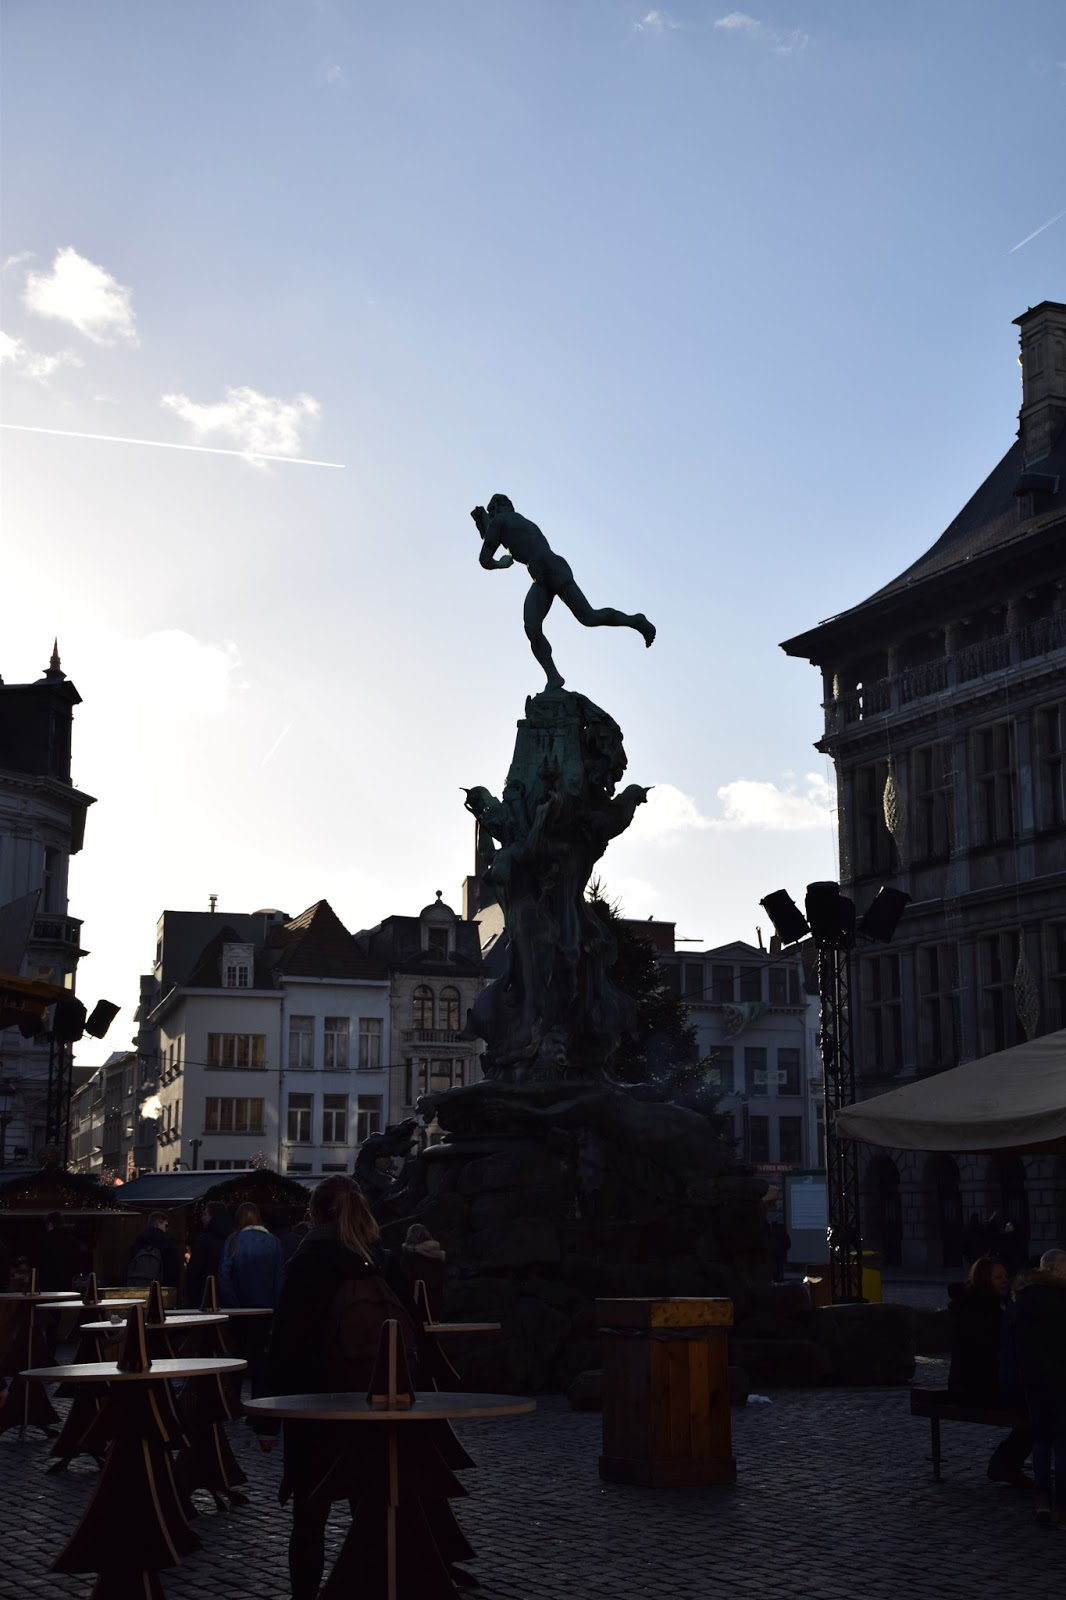 Antwerpia zwedzanie